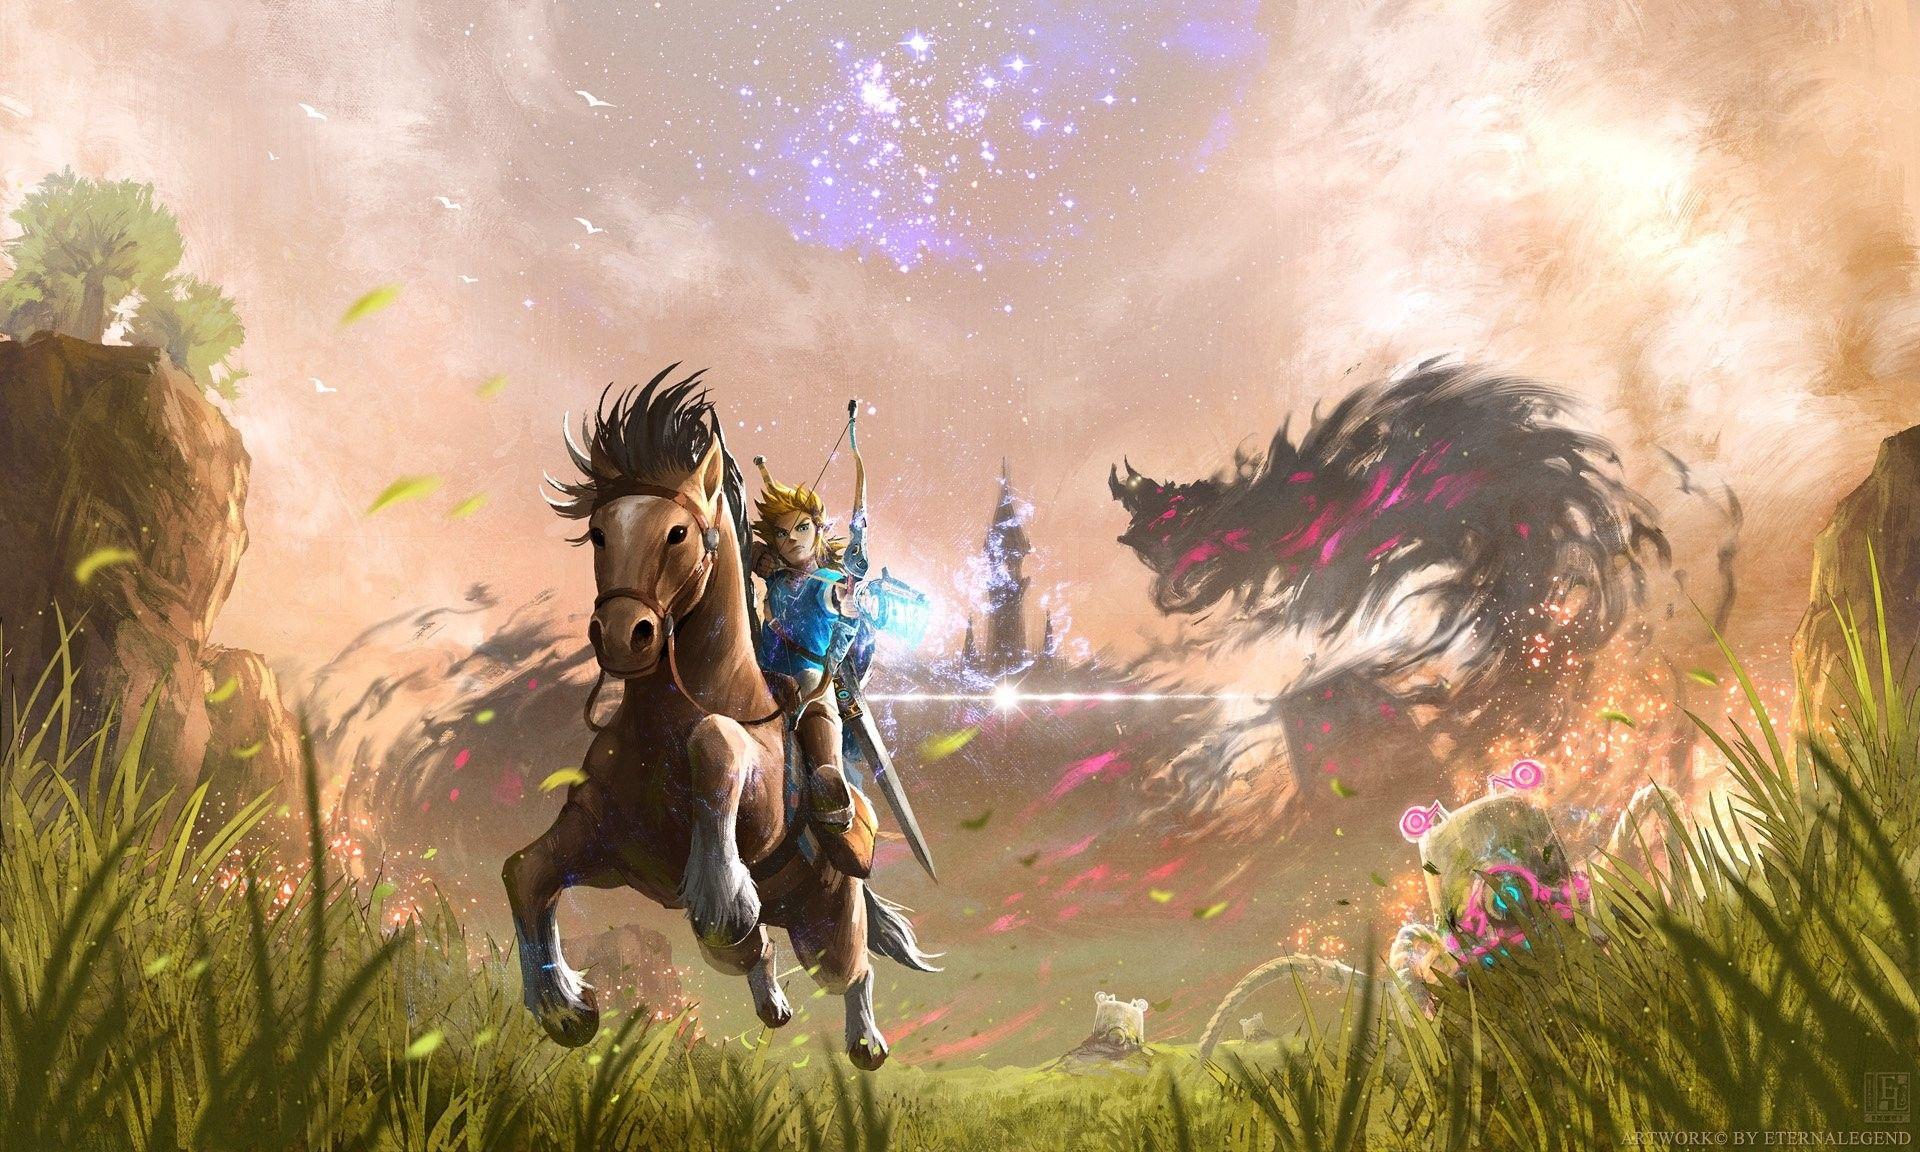 68 Zelda 4k Wallpapers On Wallpaperplay Breath Of The Wild Legend Of Zelda Breath Of The Wild Wallpaper